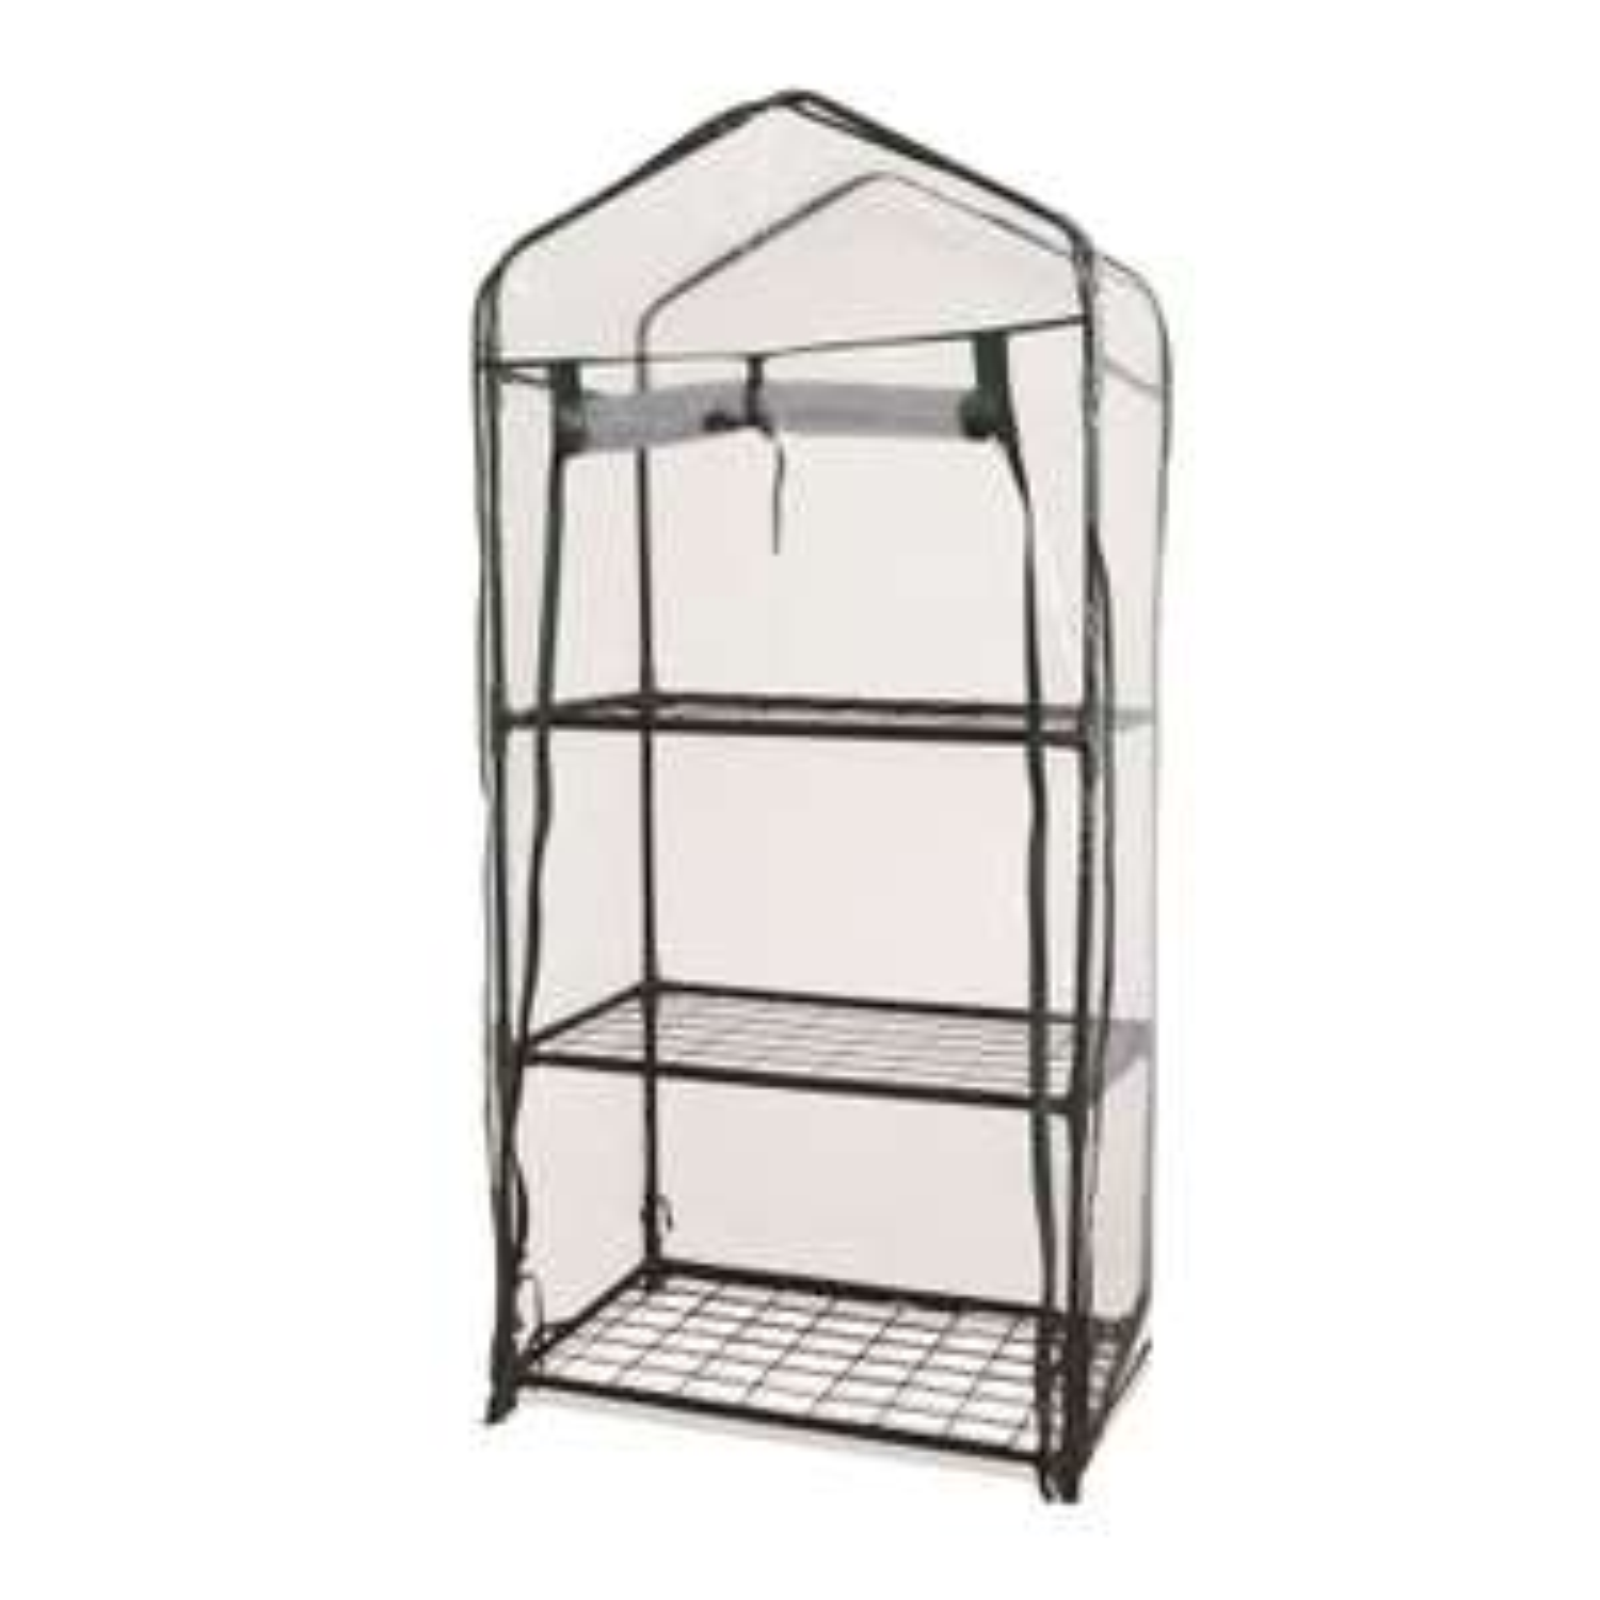 3 Tier Mini Greenhouse - £10.95 @ Homebase